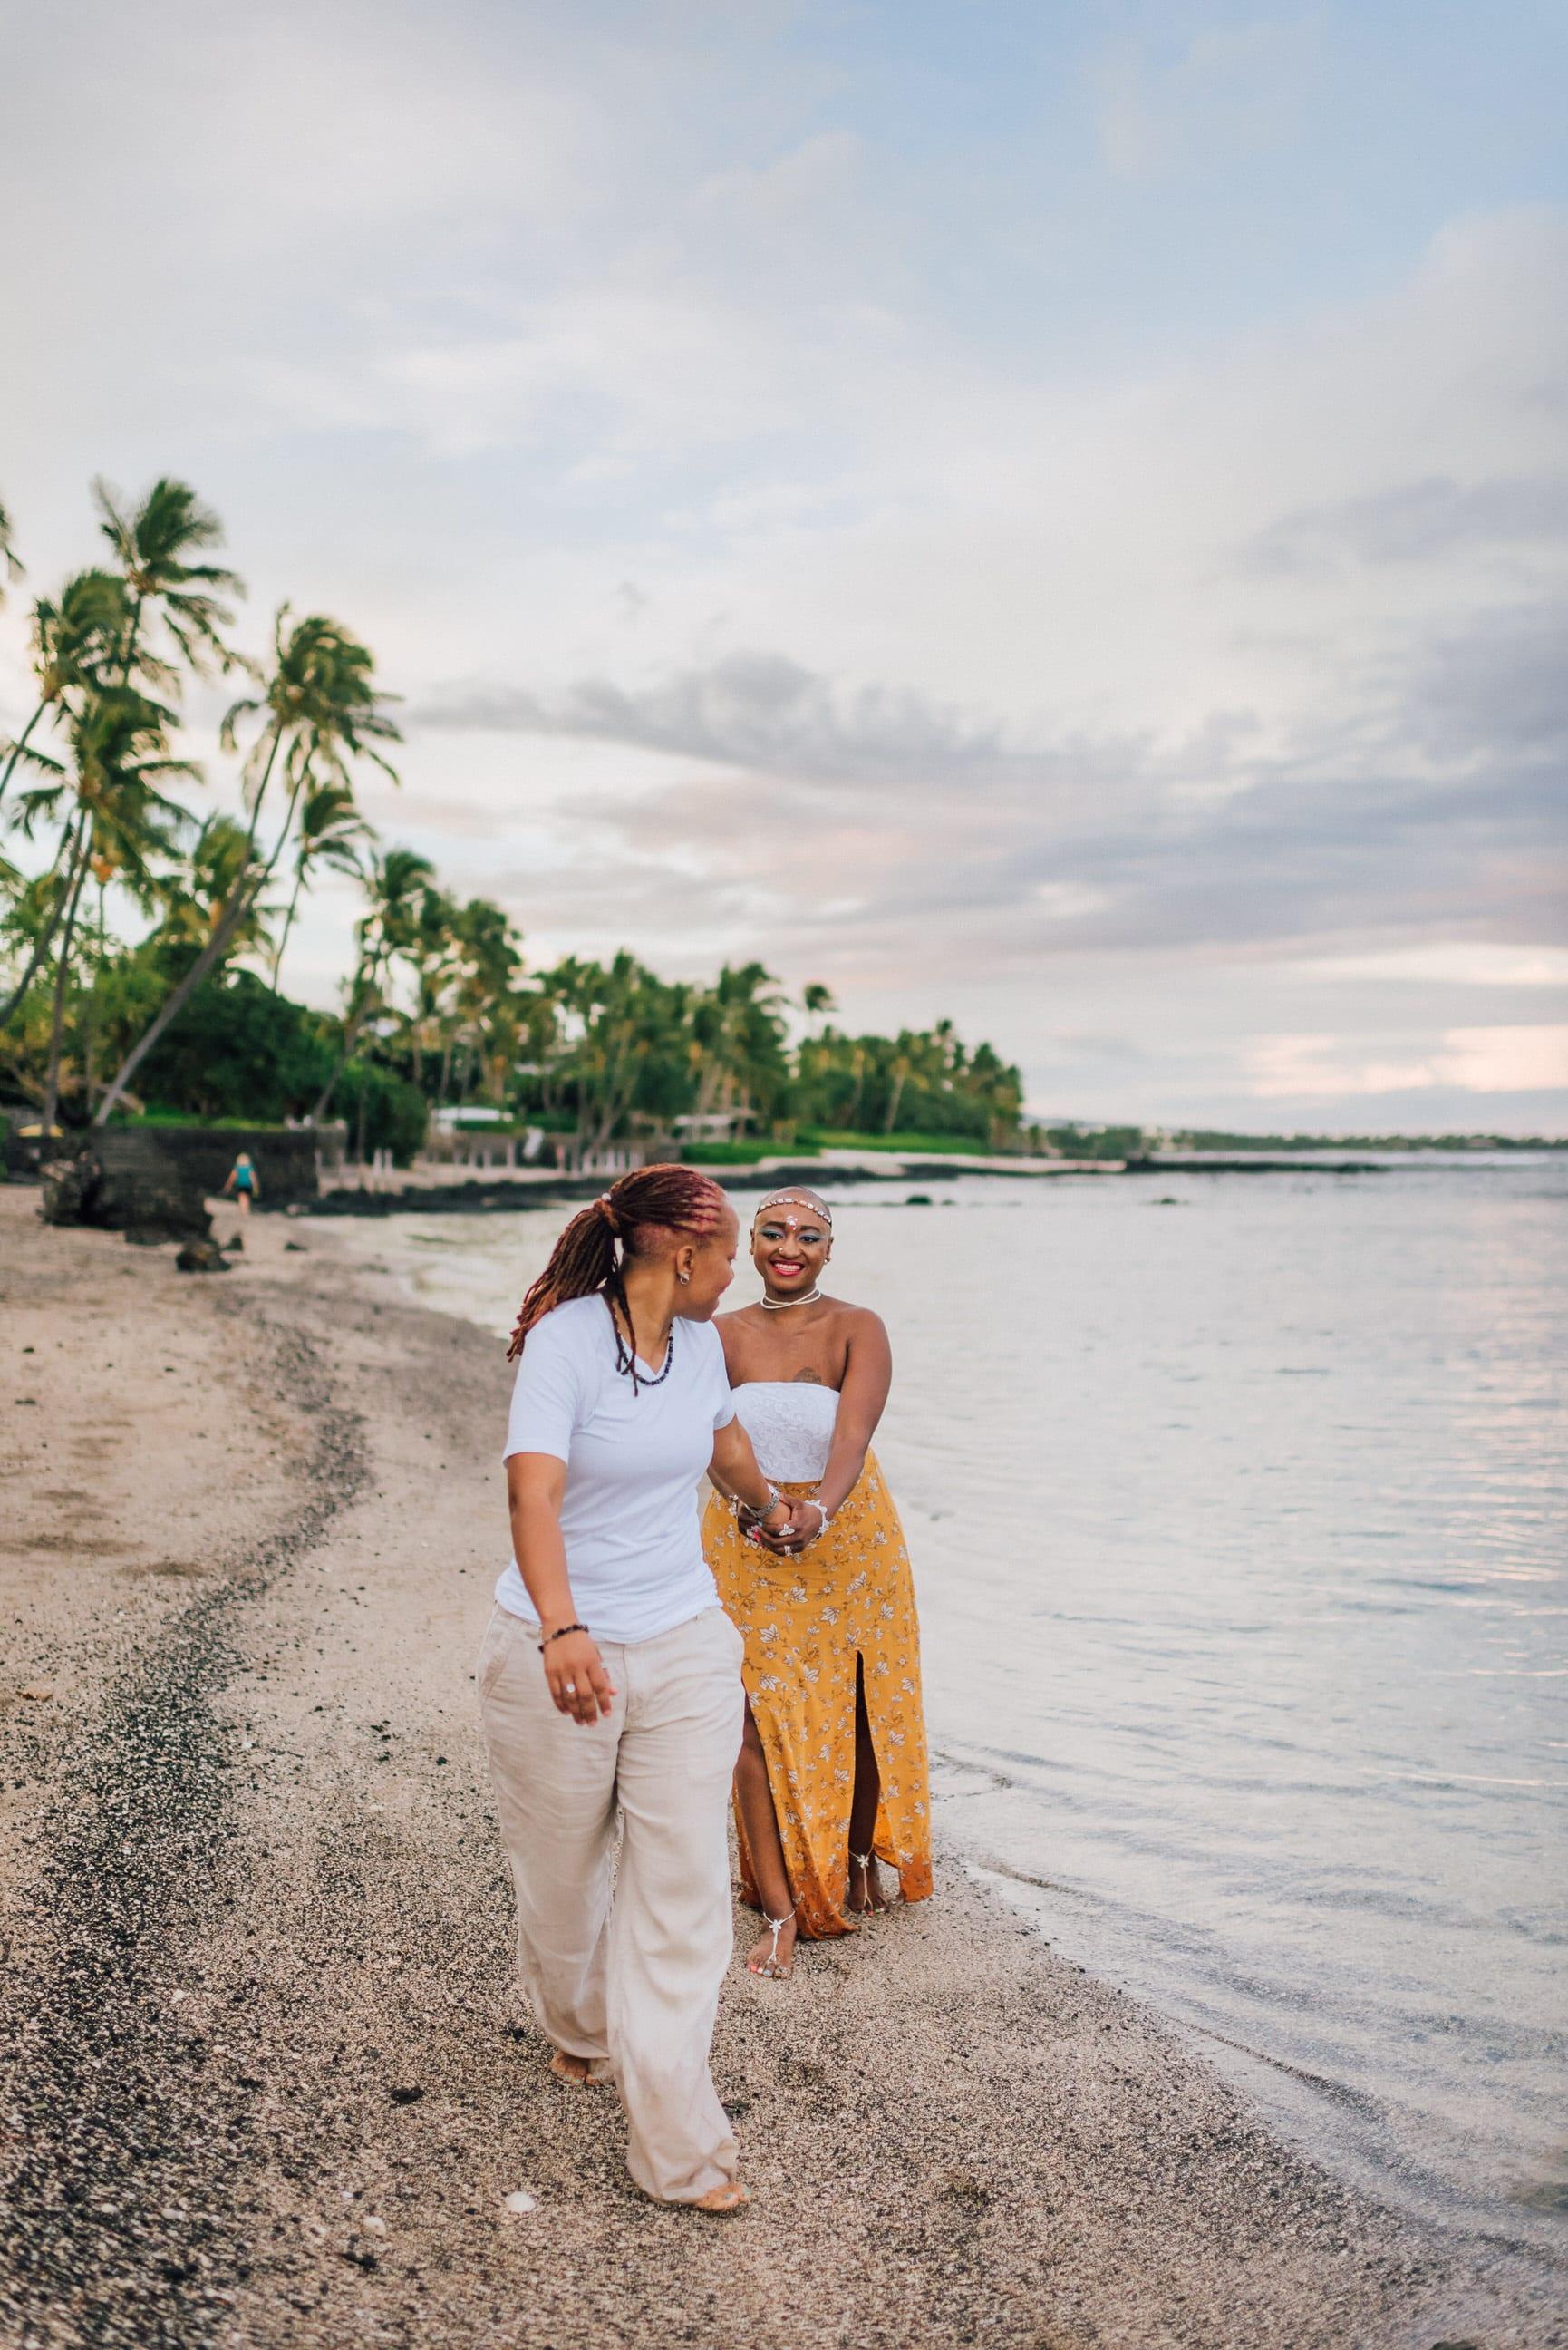 Big-Island-Photographer-Sunrise-9.jpg